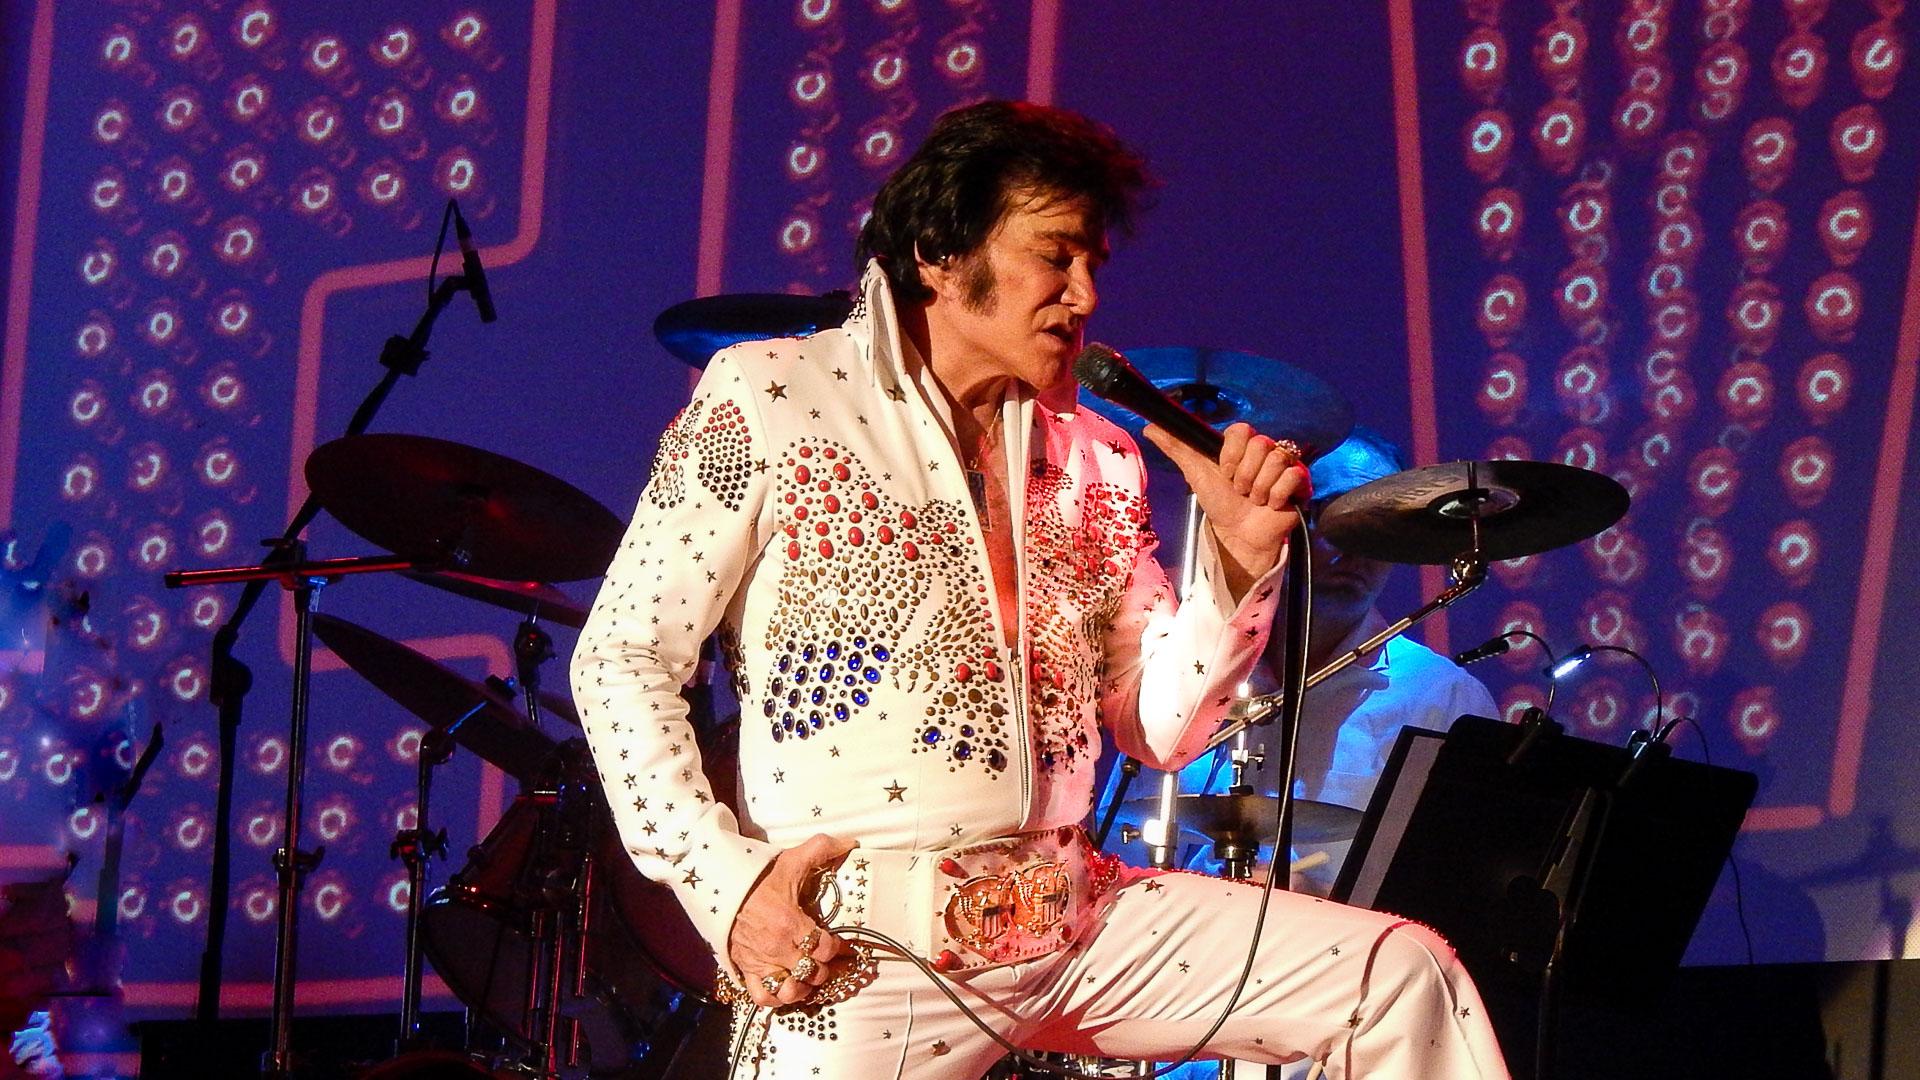 190320 Jerry Pressley White Suite Edit - Jerry Presley sings his cousin Elvis' hits